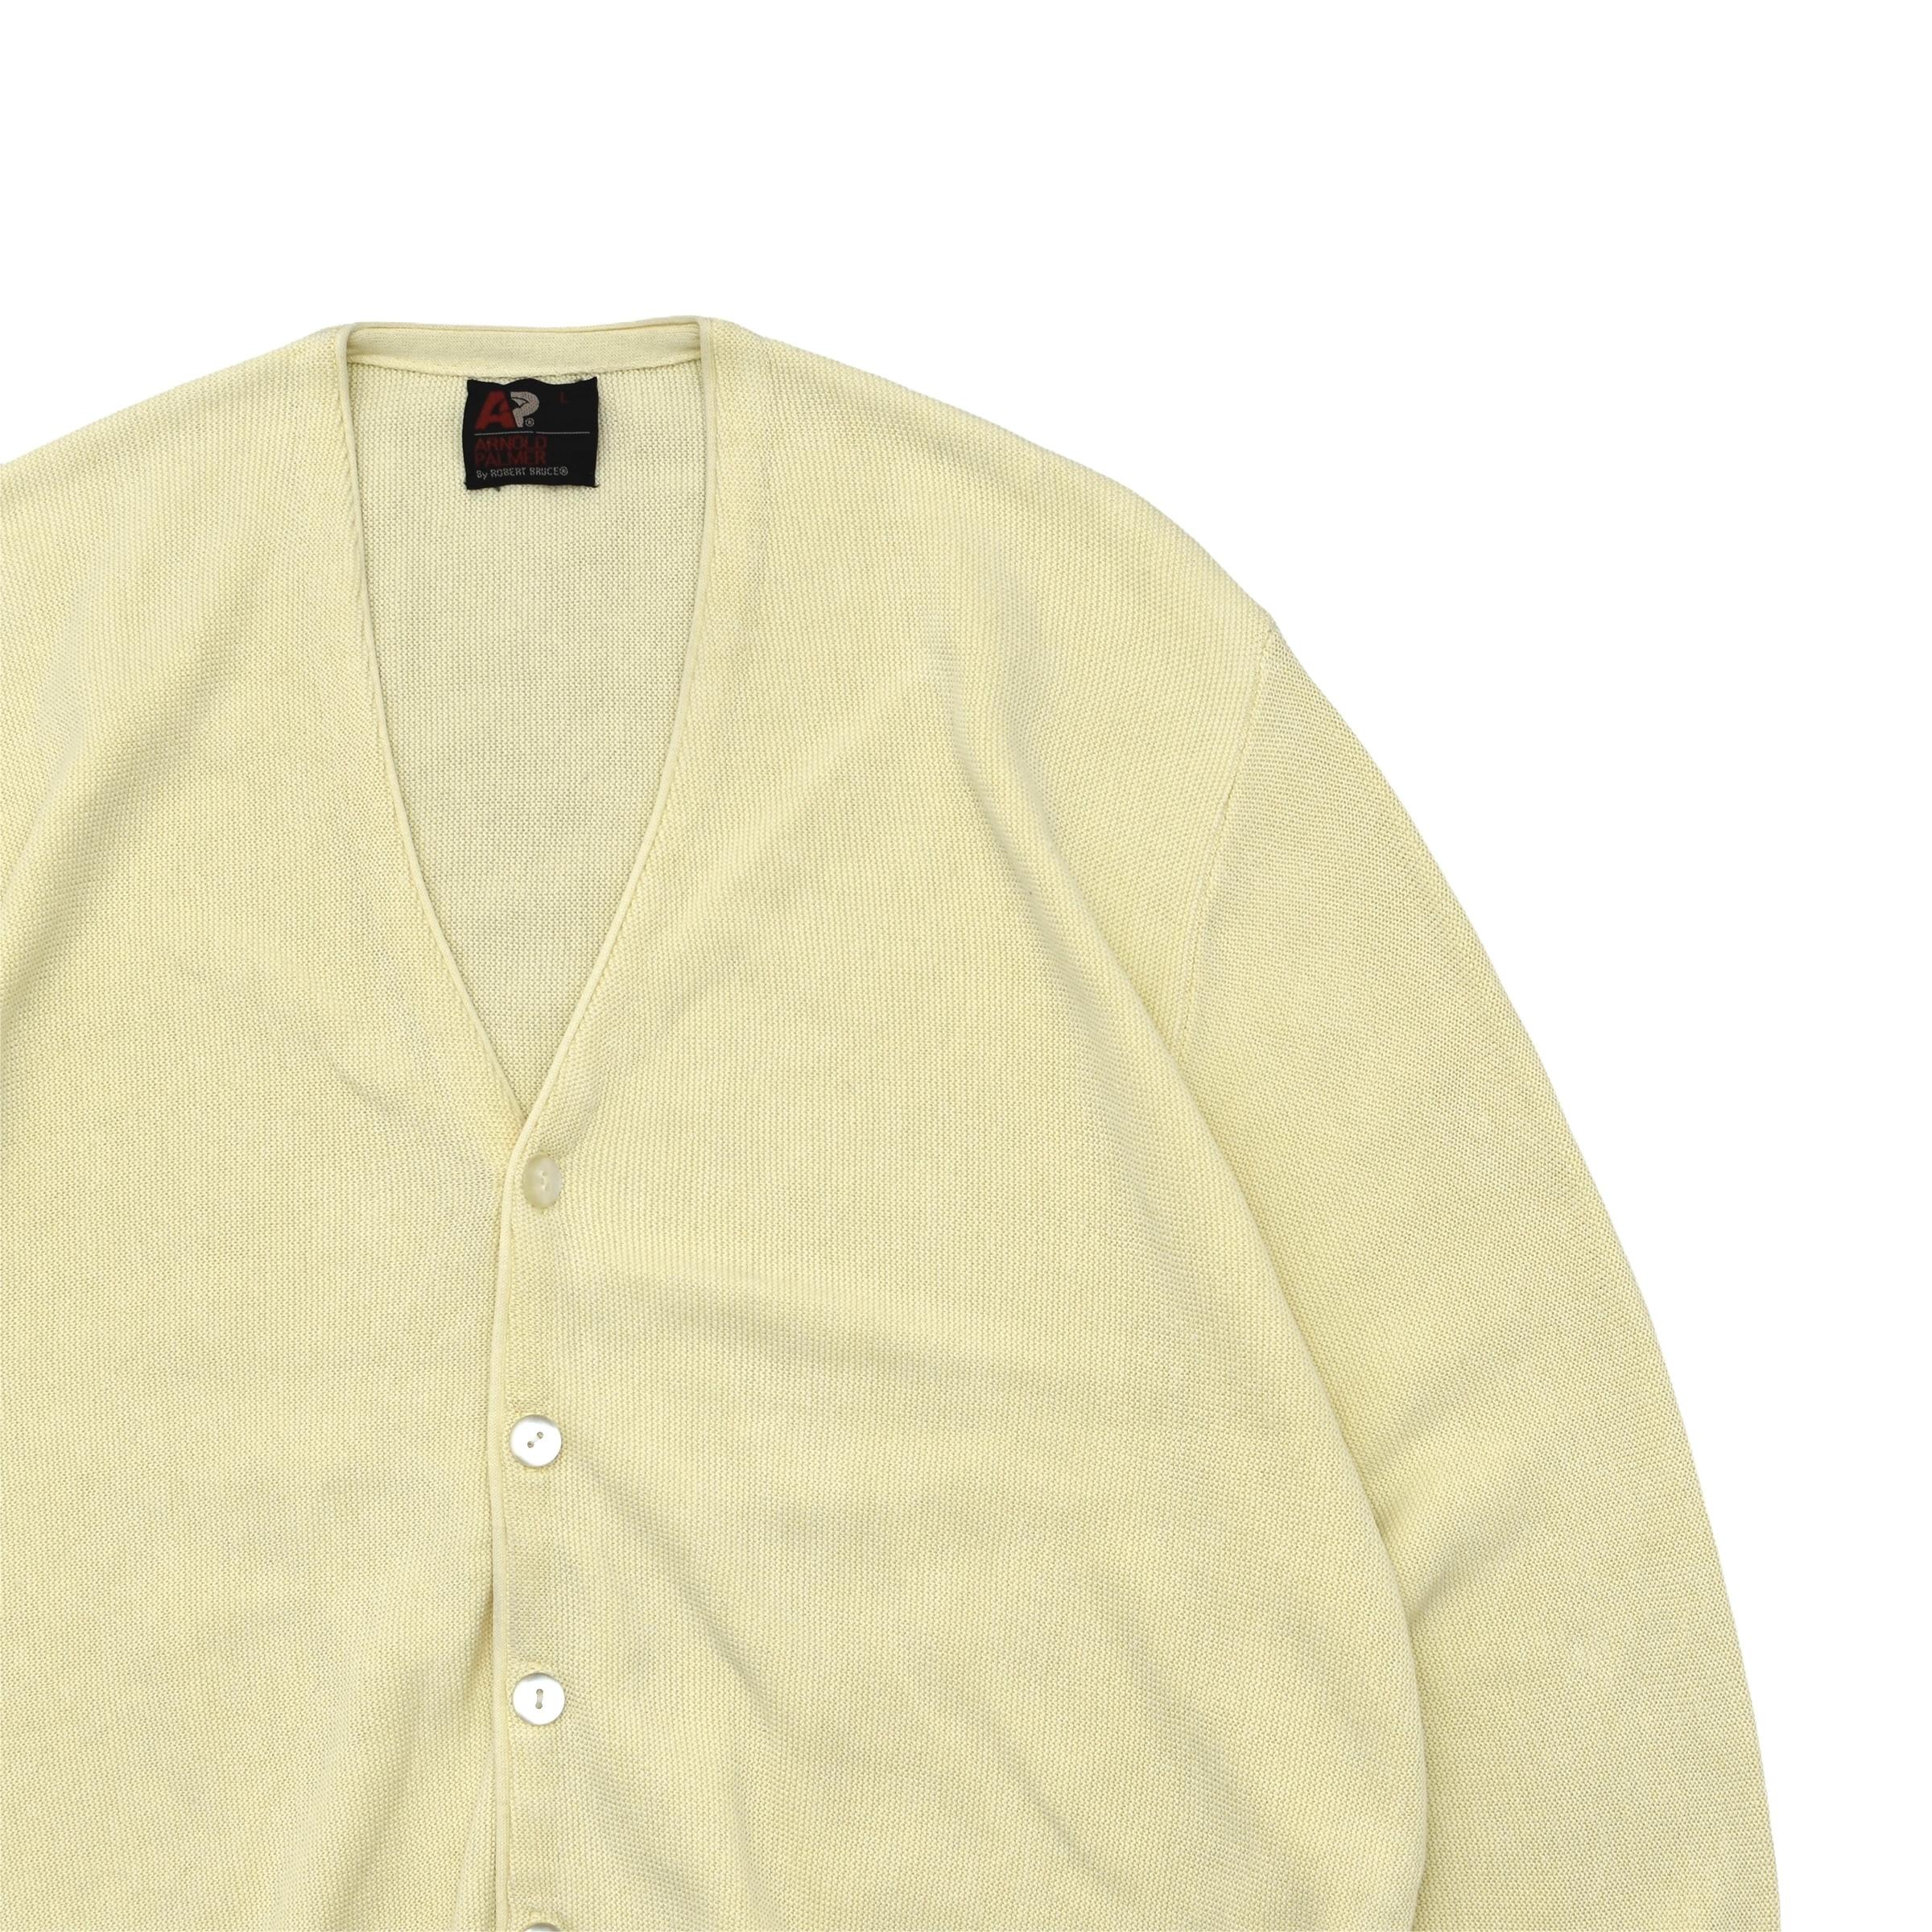 90's Arnold Palmer cotton knit cardigan